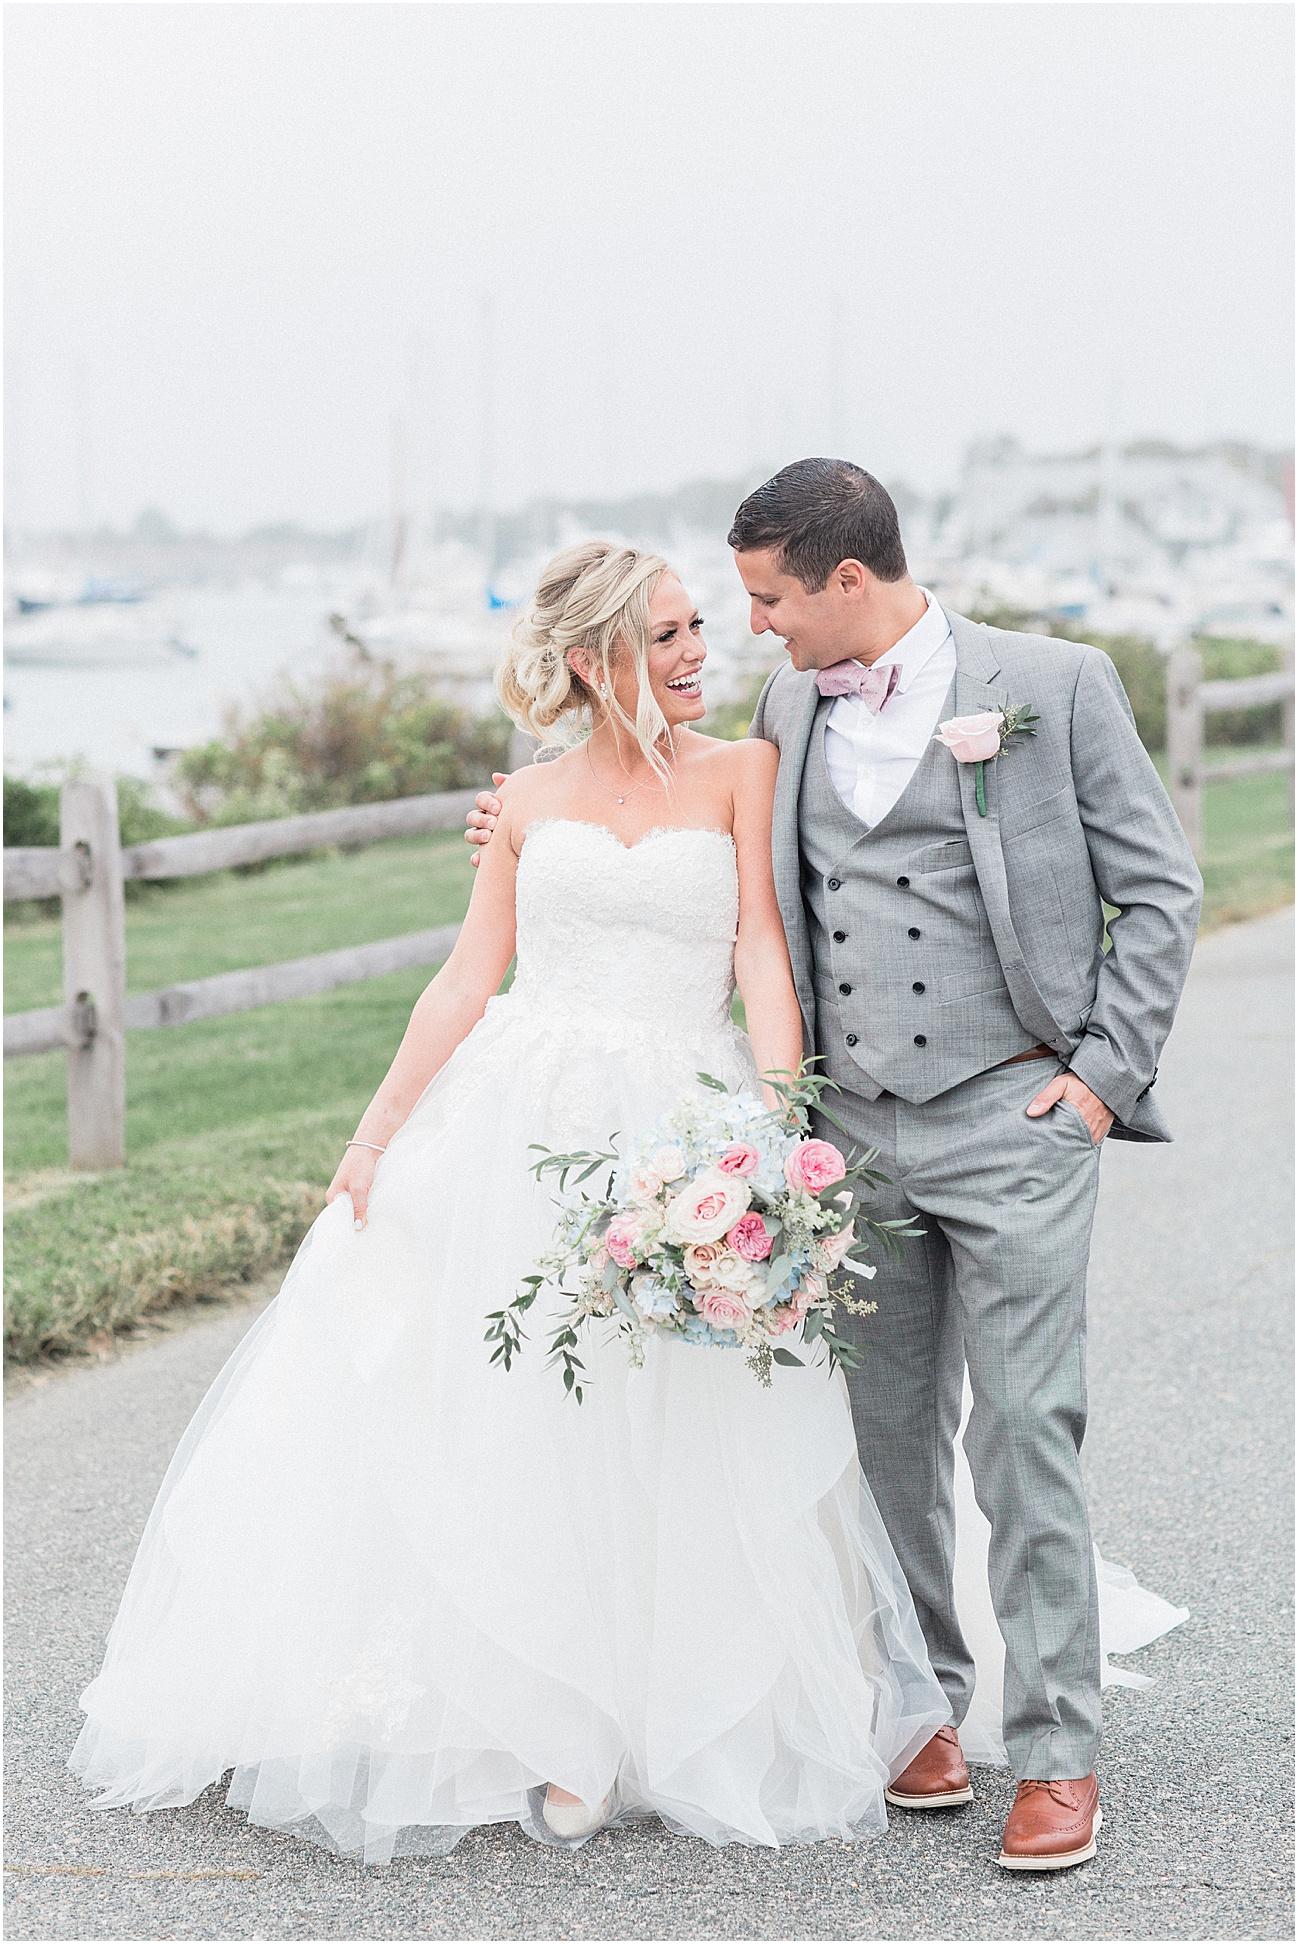 deanna_tyler_popponesset_inn_nautical_dusty_rose_pink_blue_french_fall_gray_bridesmaid_cape_cod_boston_wedding_photographer_meredith_jane_photography_photo_1351.jpg